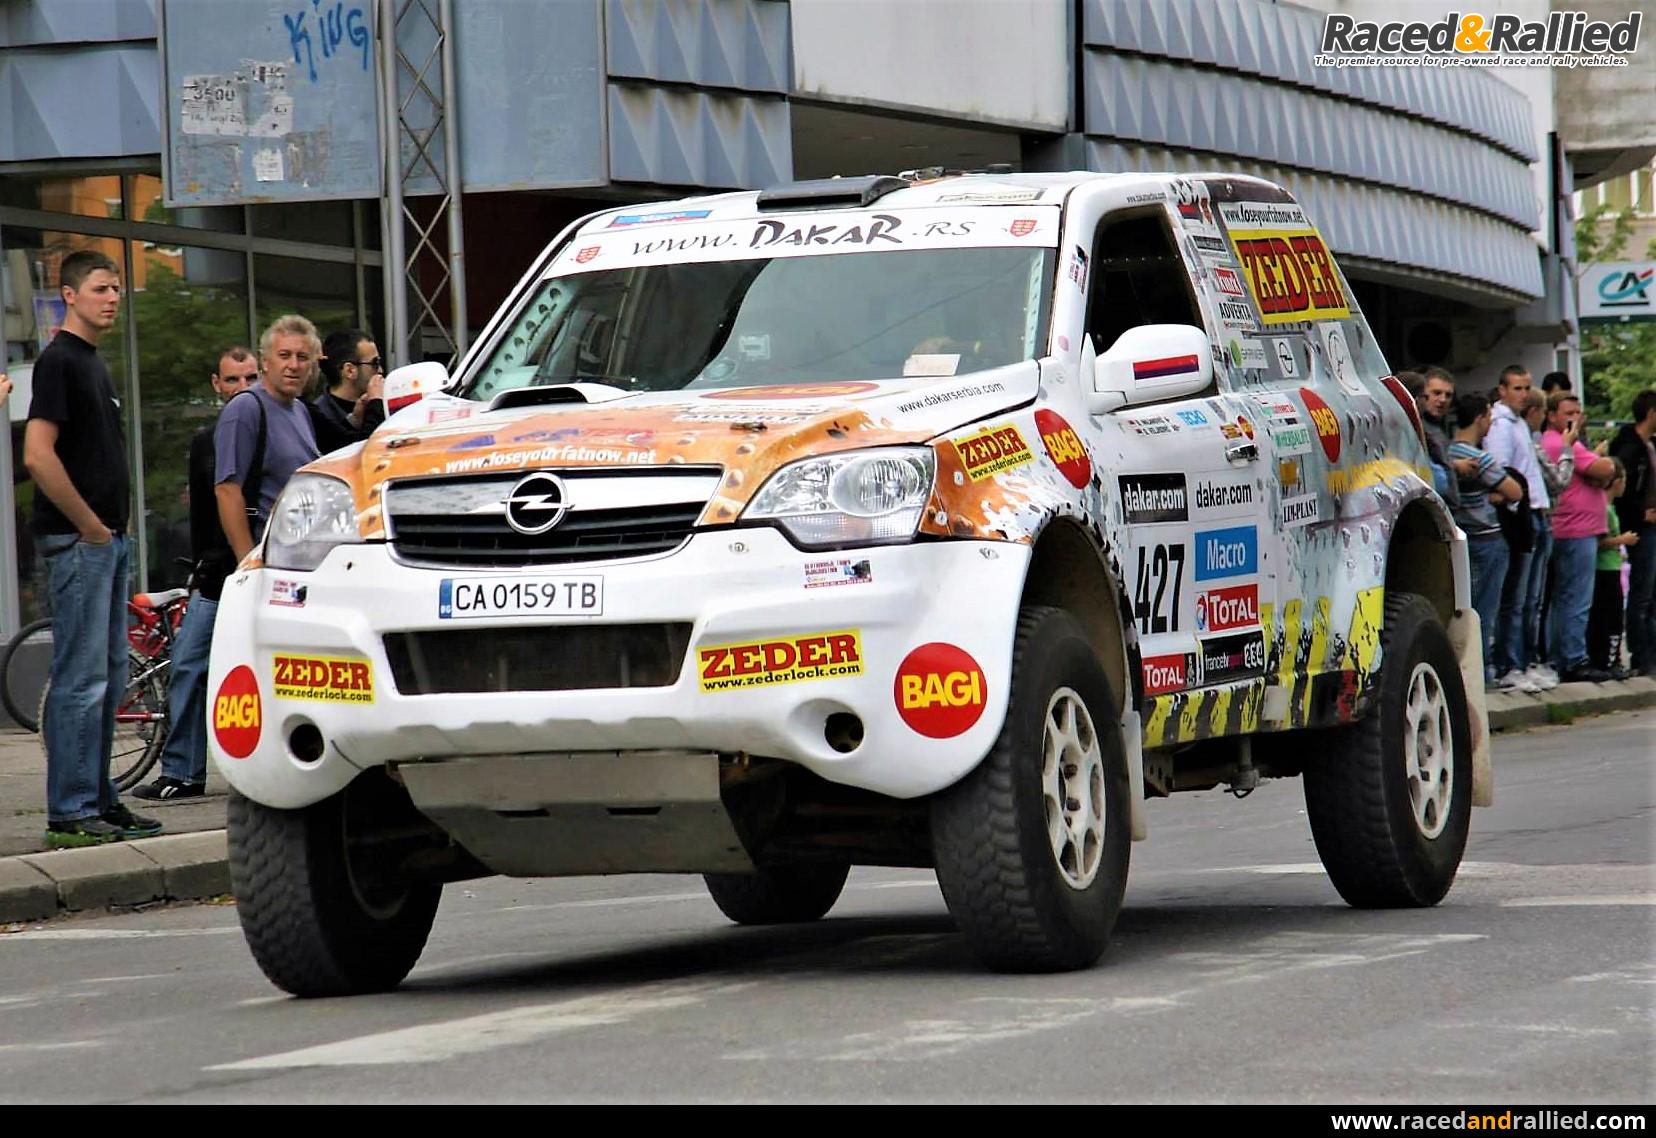 Vehicles For Sale: Opel Antara RR3 Dakar For Sale